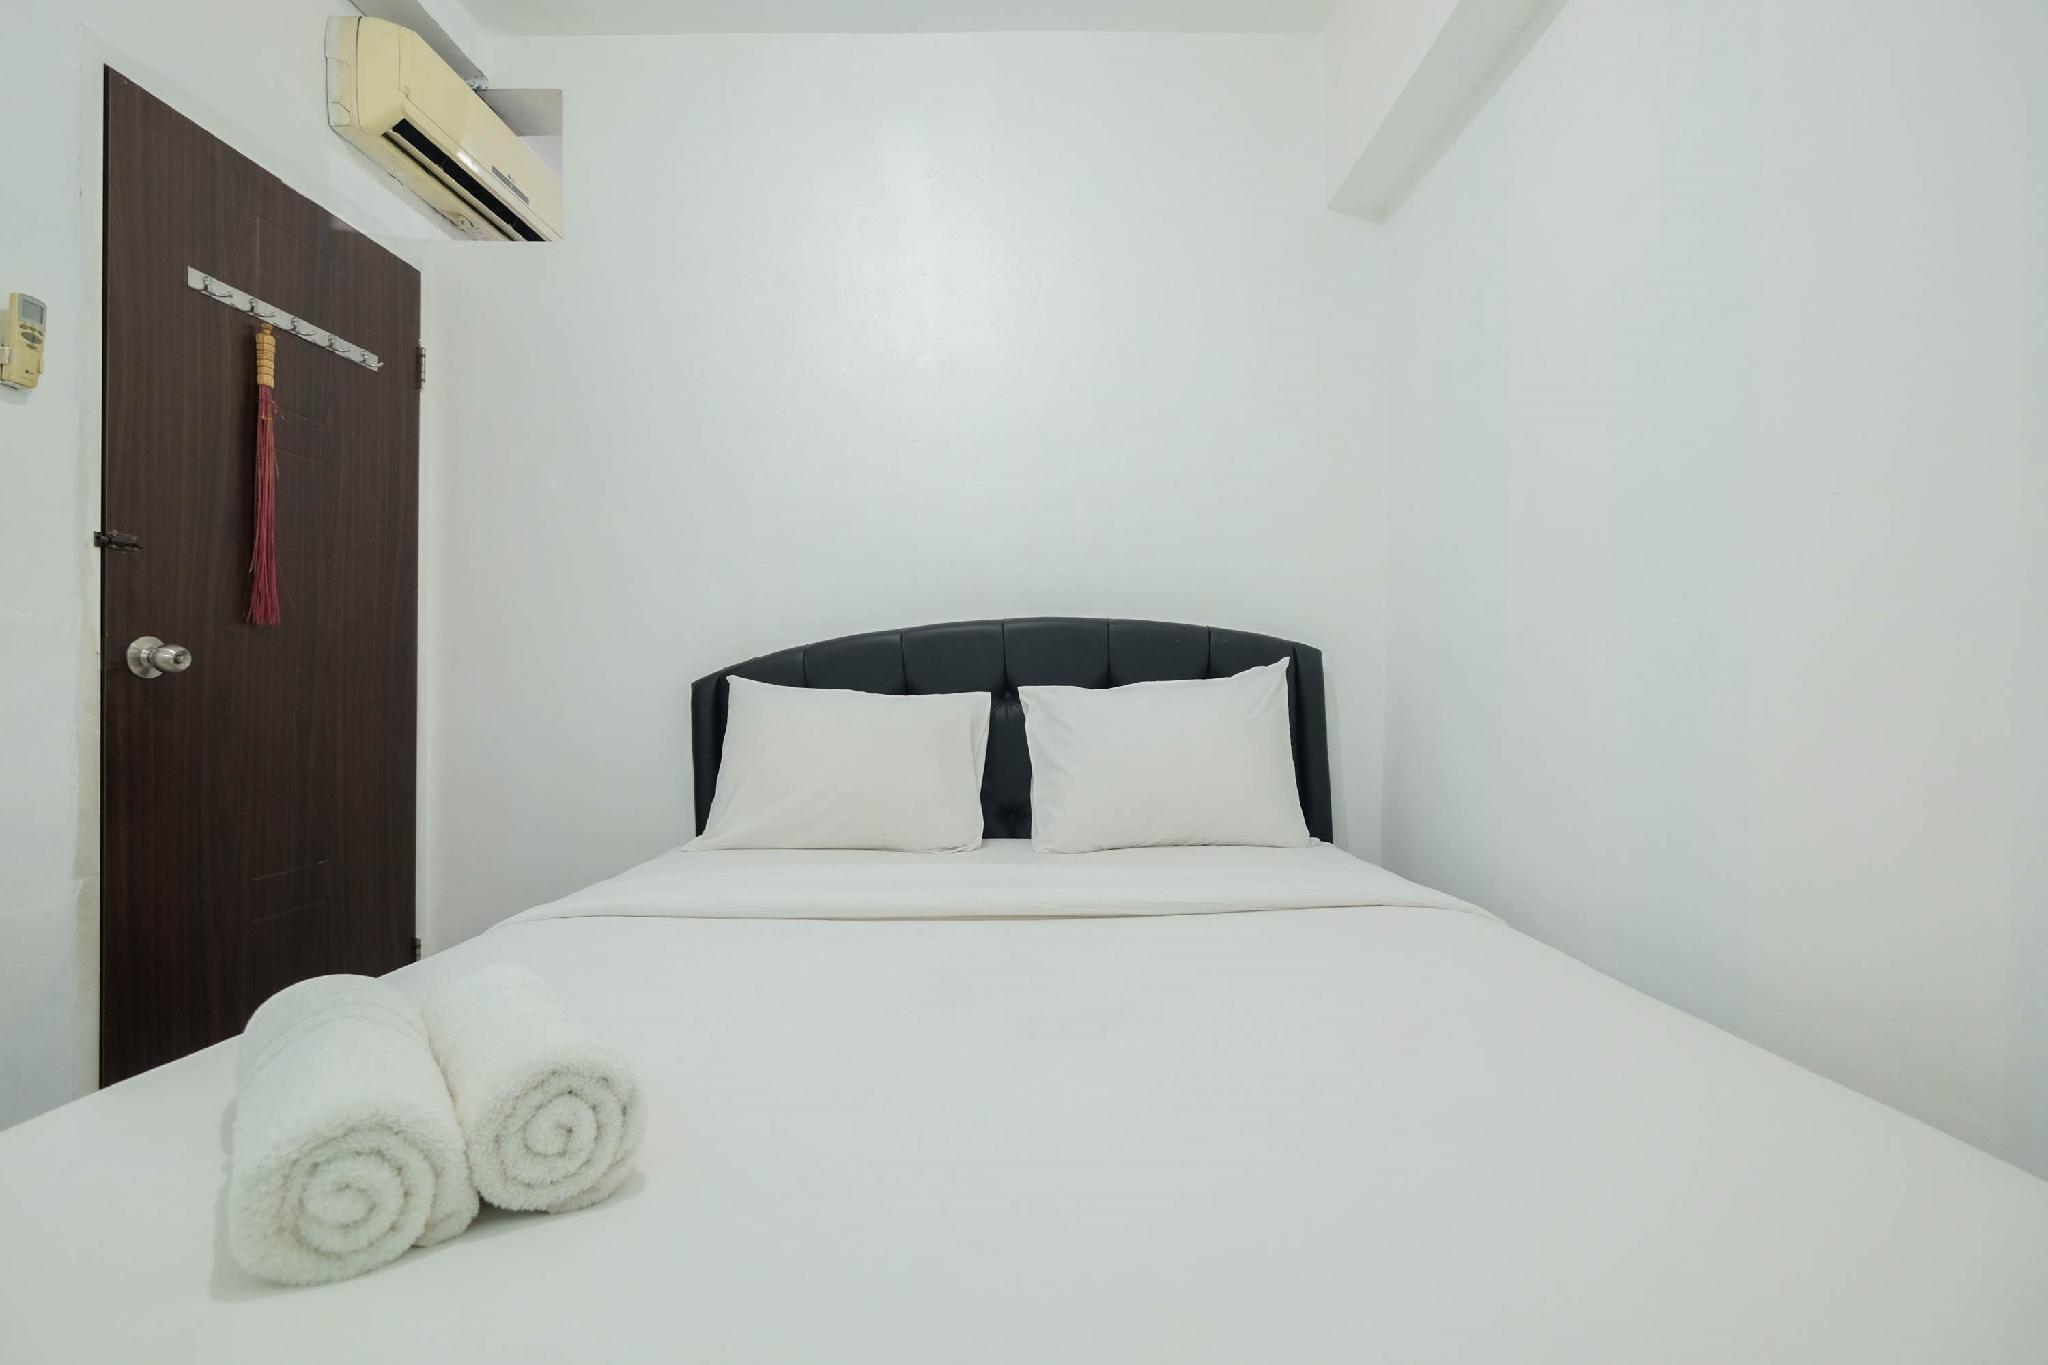 New Furnished 2BR Apt @ Mutiara Bekasi By Travelio